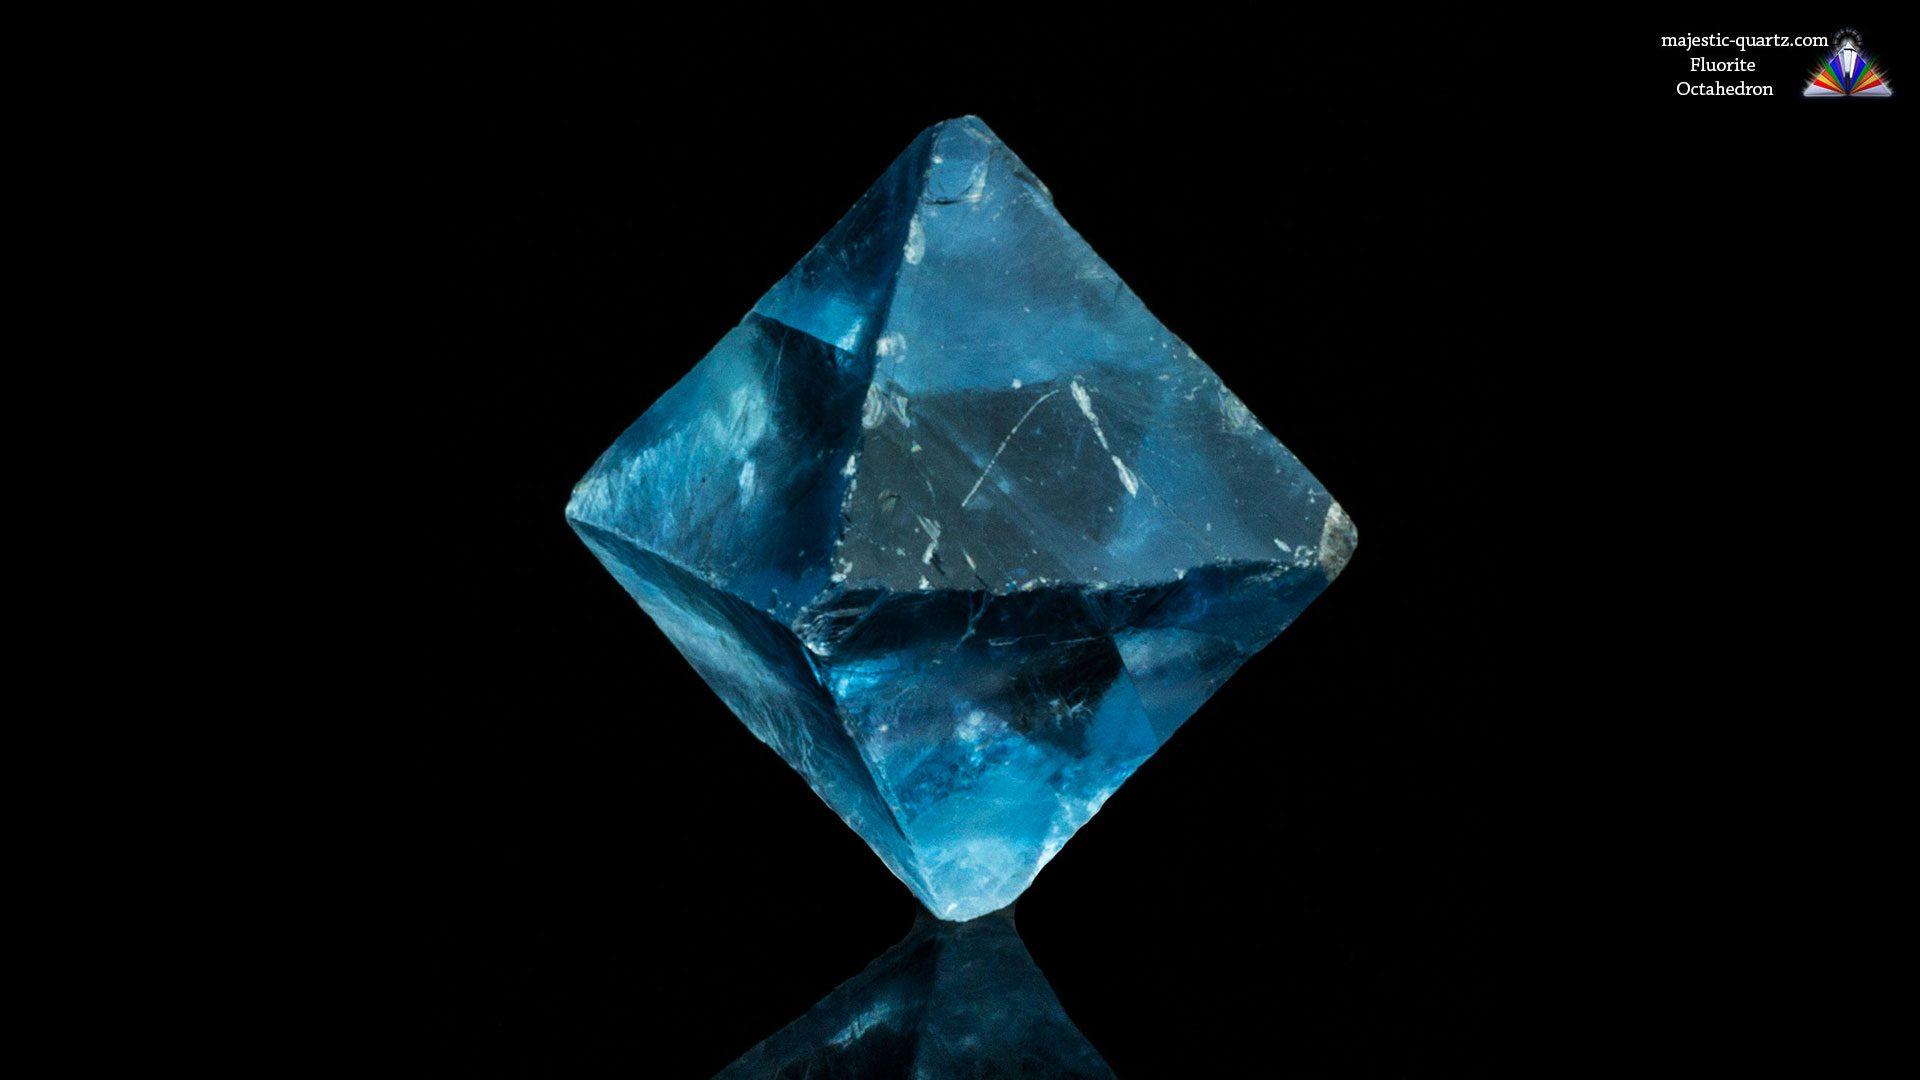 Fluorite Octahedron Crystal Specimen